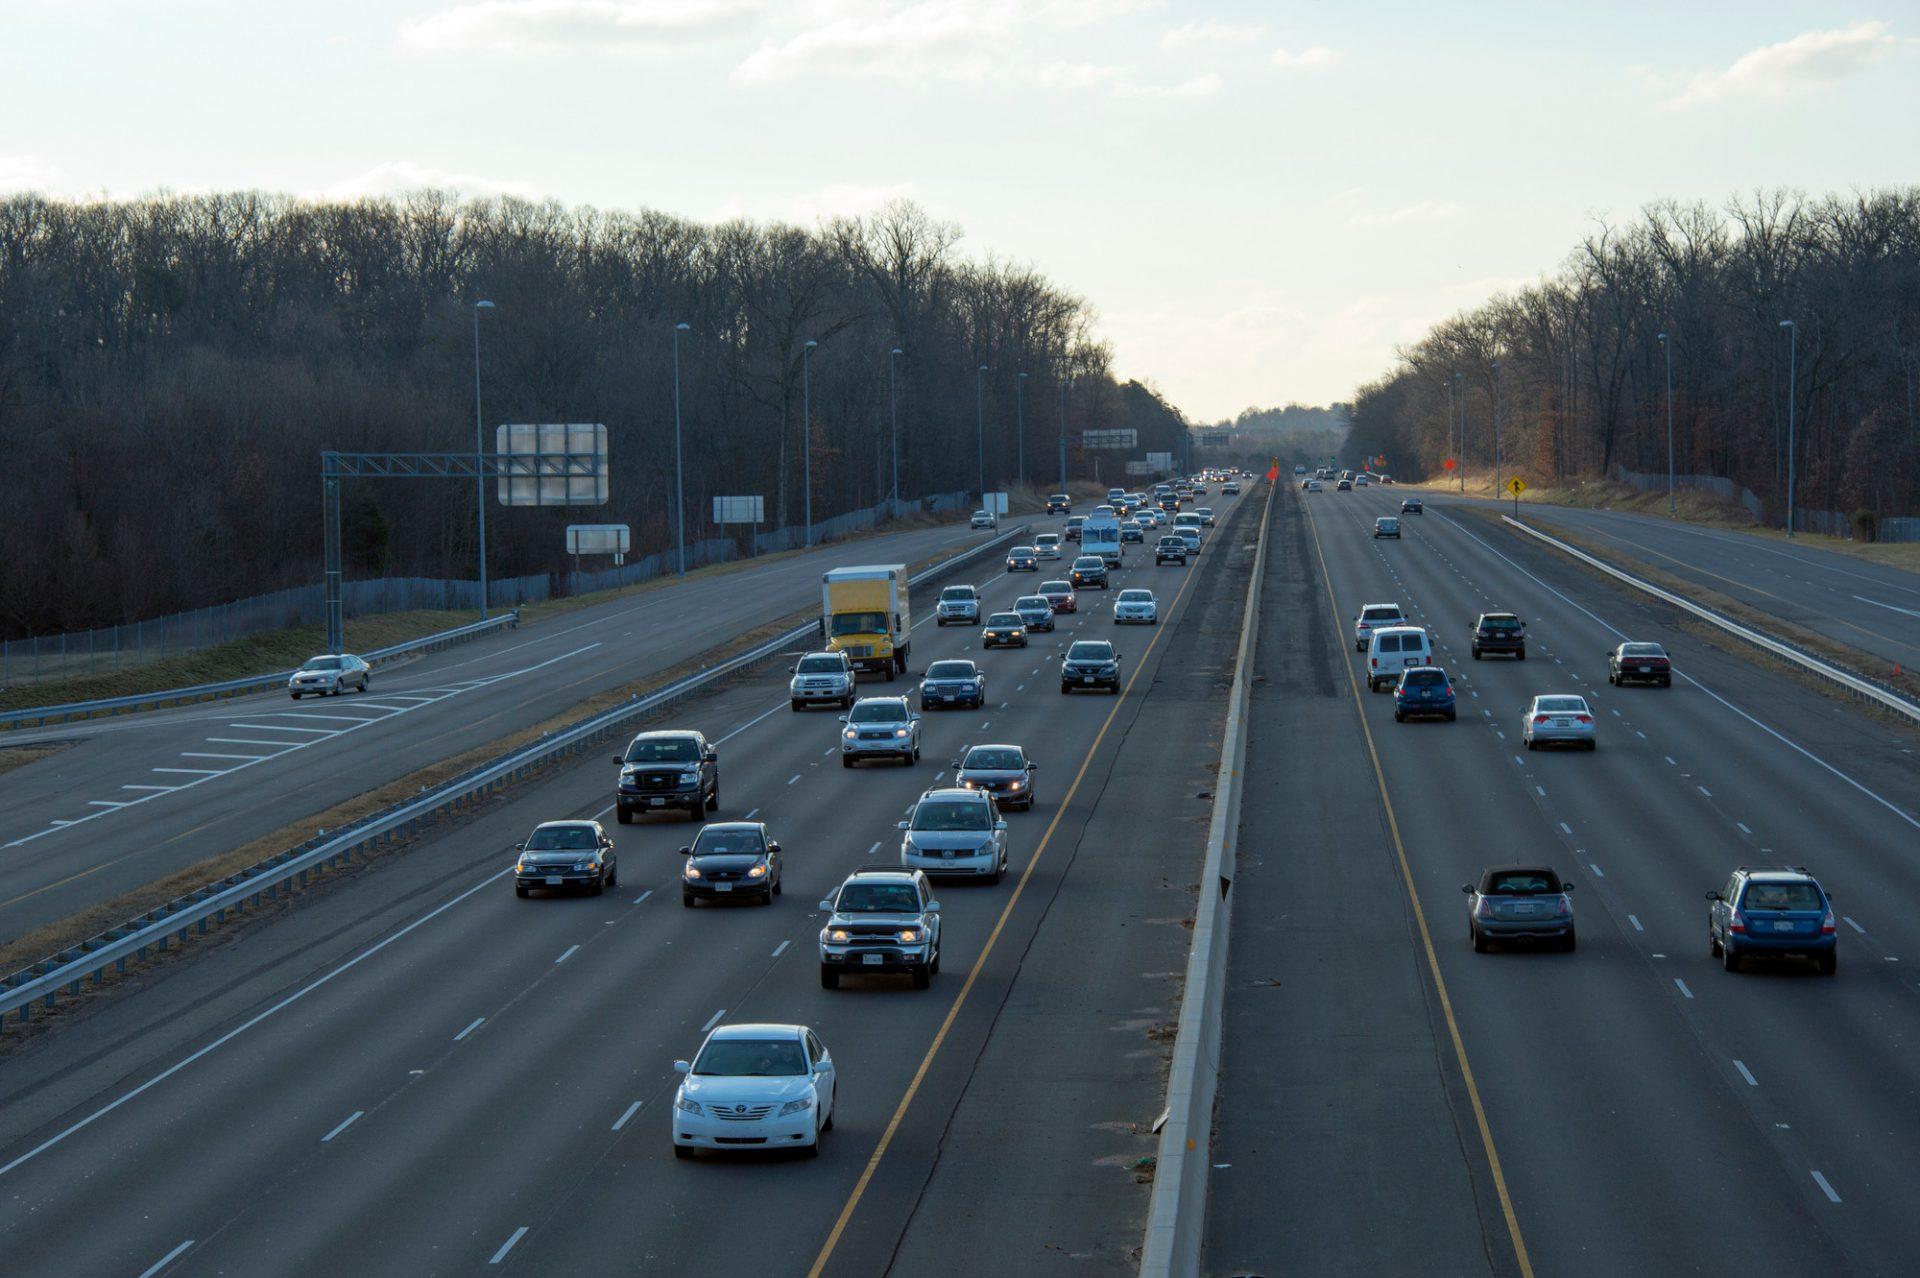 Photo: Traffic on a highway near Chantilly, Virginia.